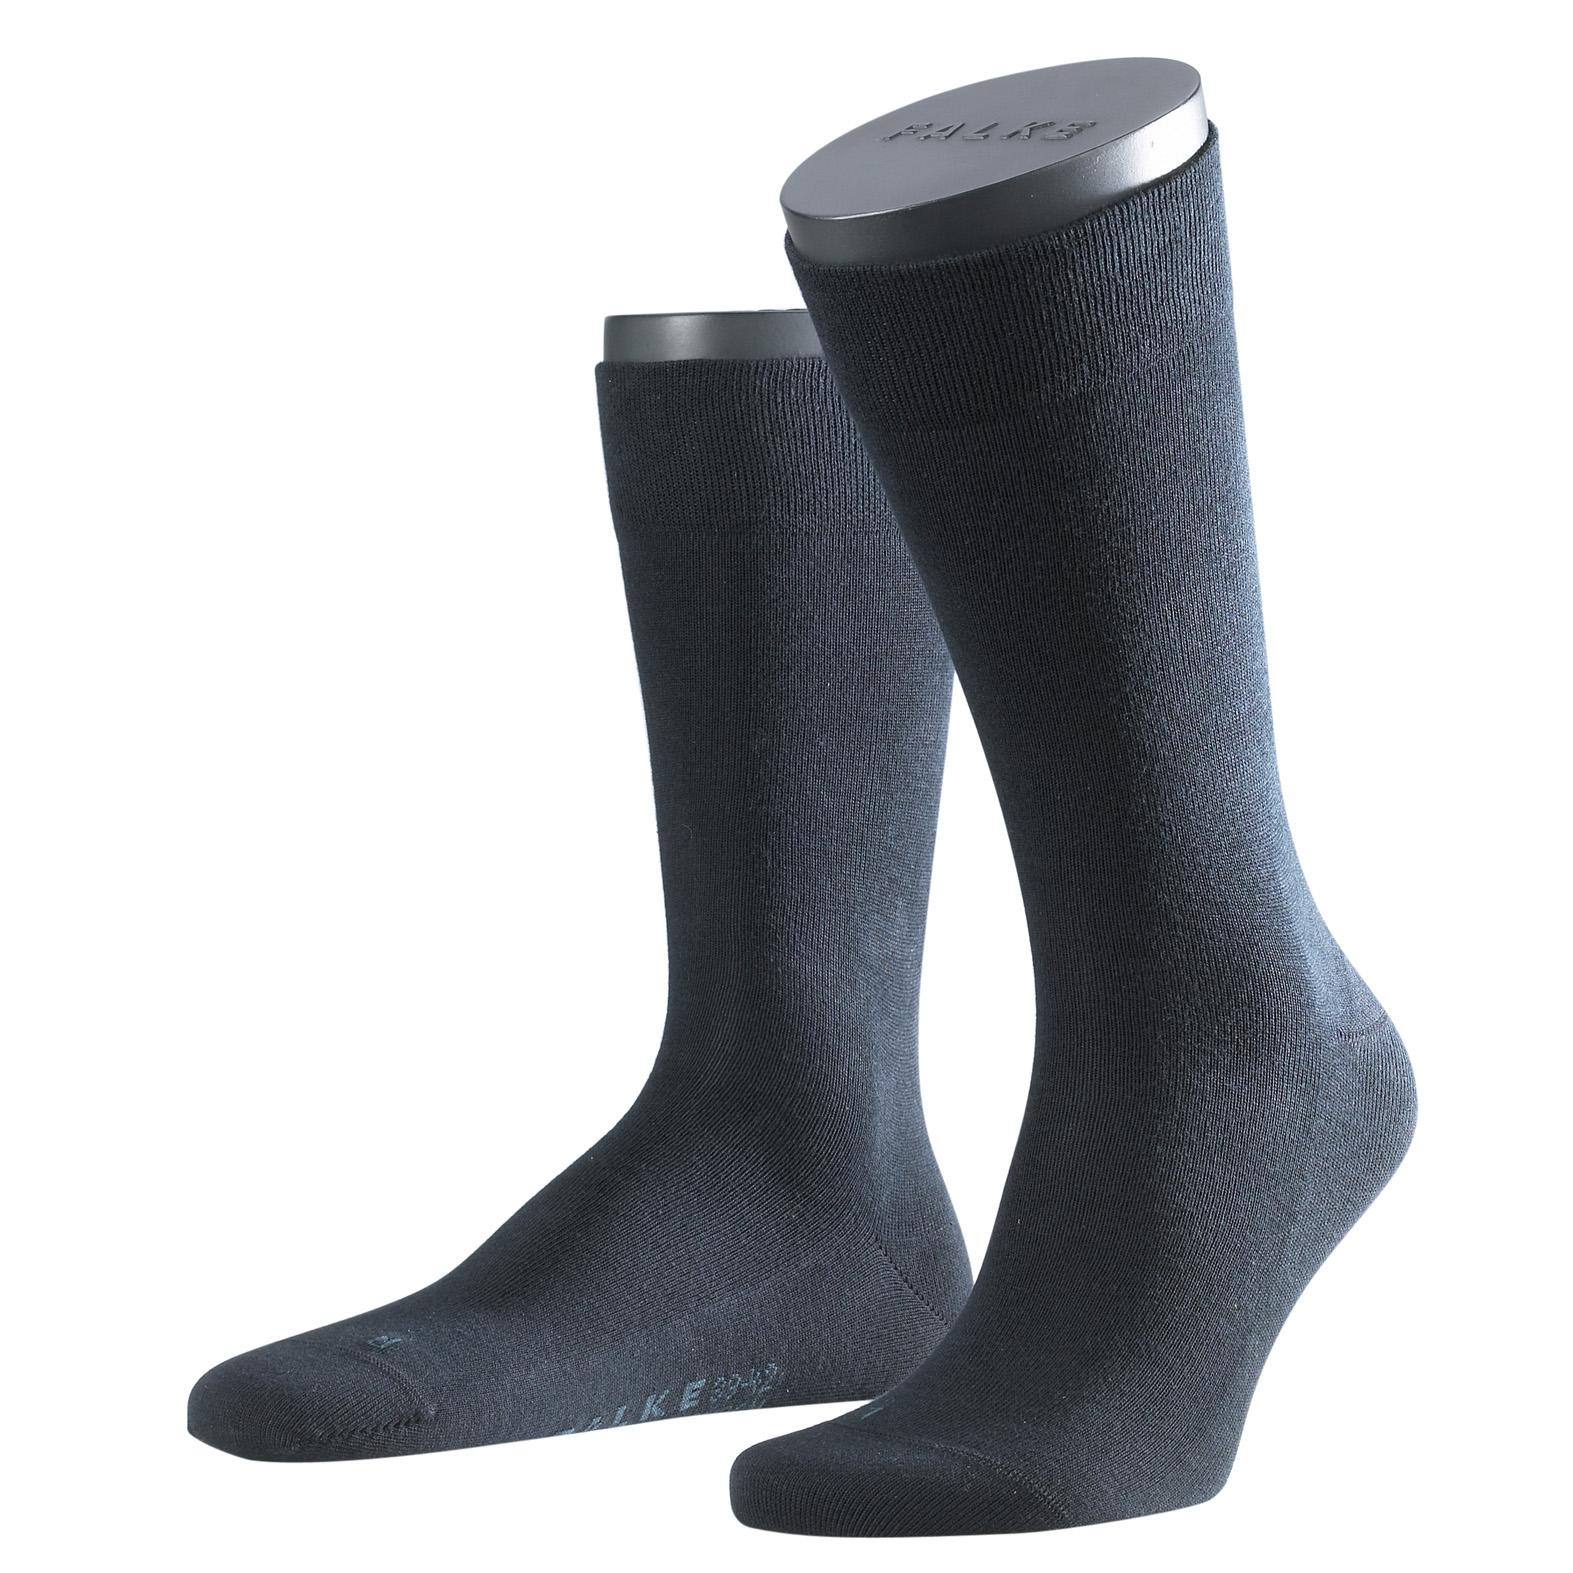 Falke Sensitive Socke London marine blau 14616 - 6370 Basic Baumwolle